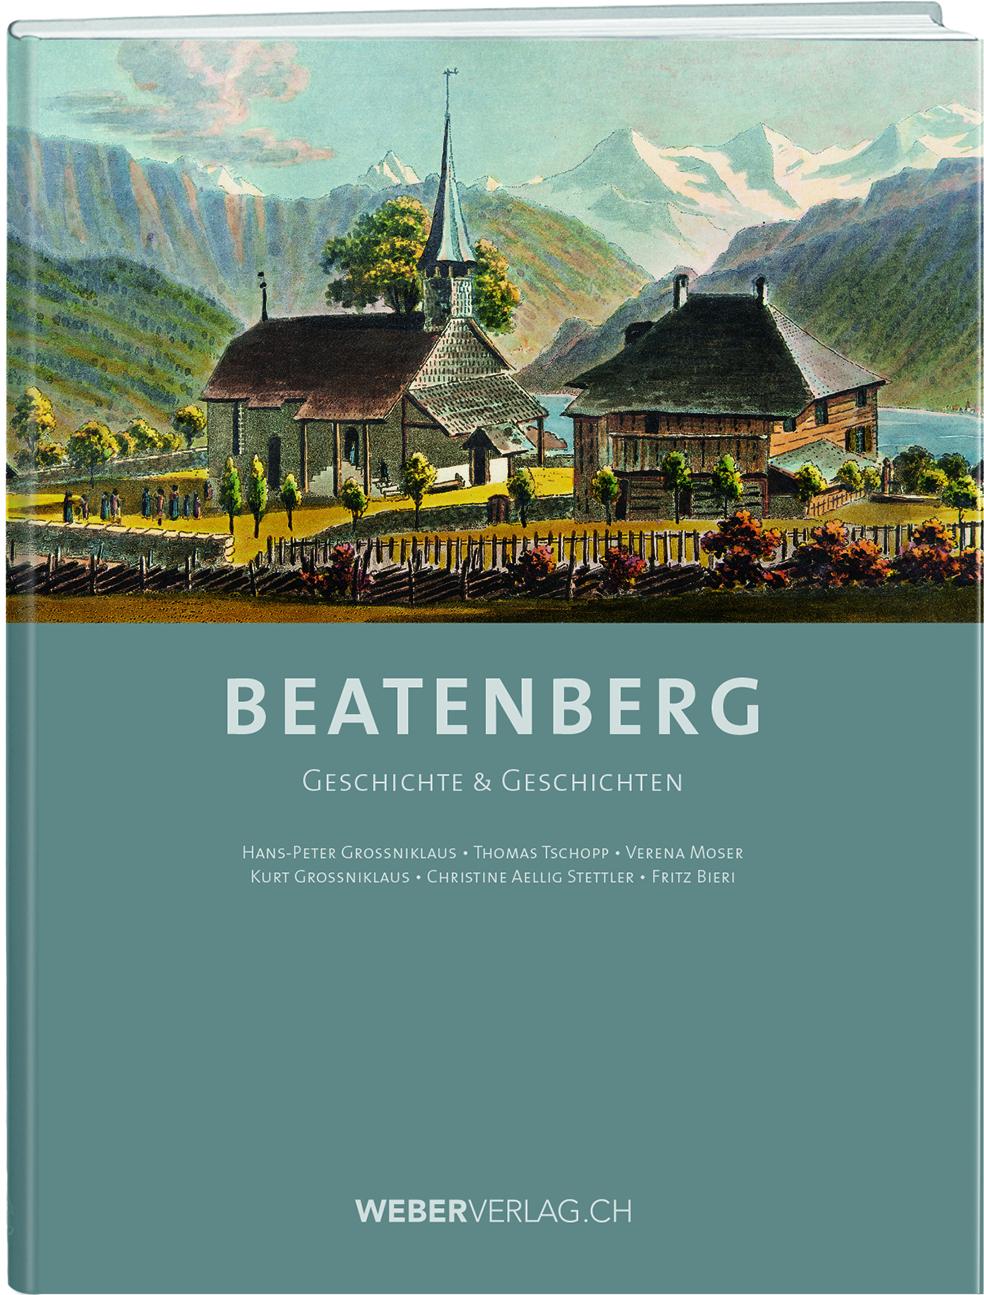 Beatenberg Christine Aellig